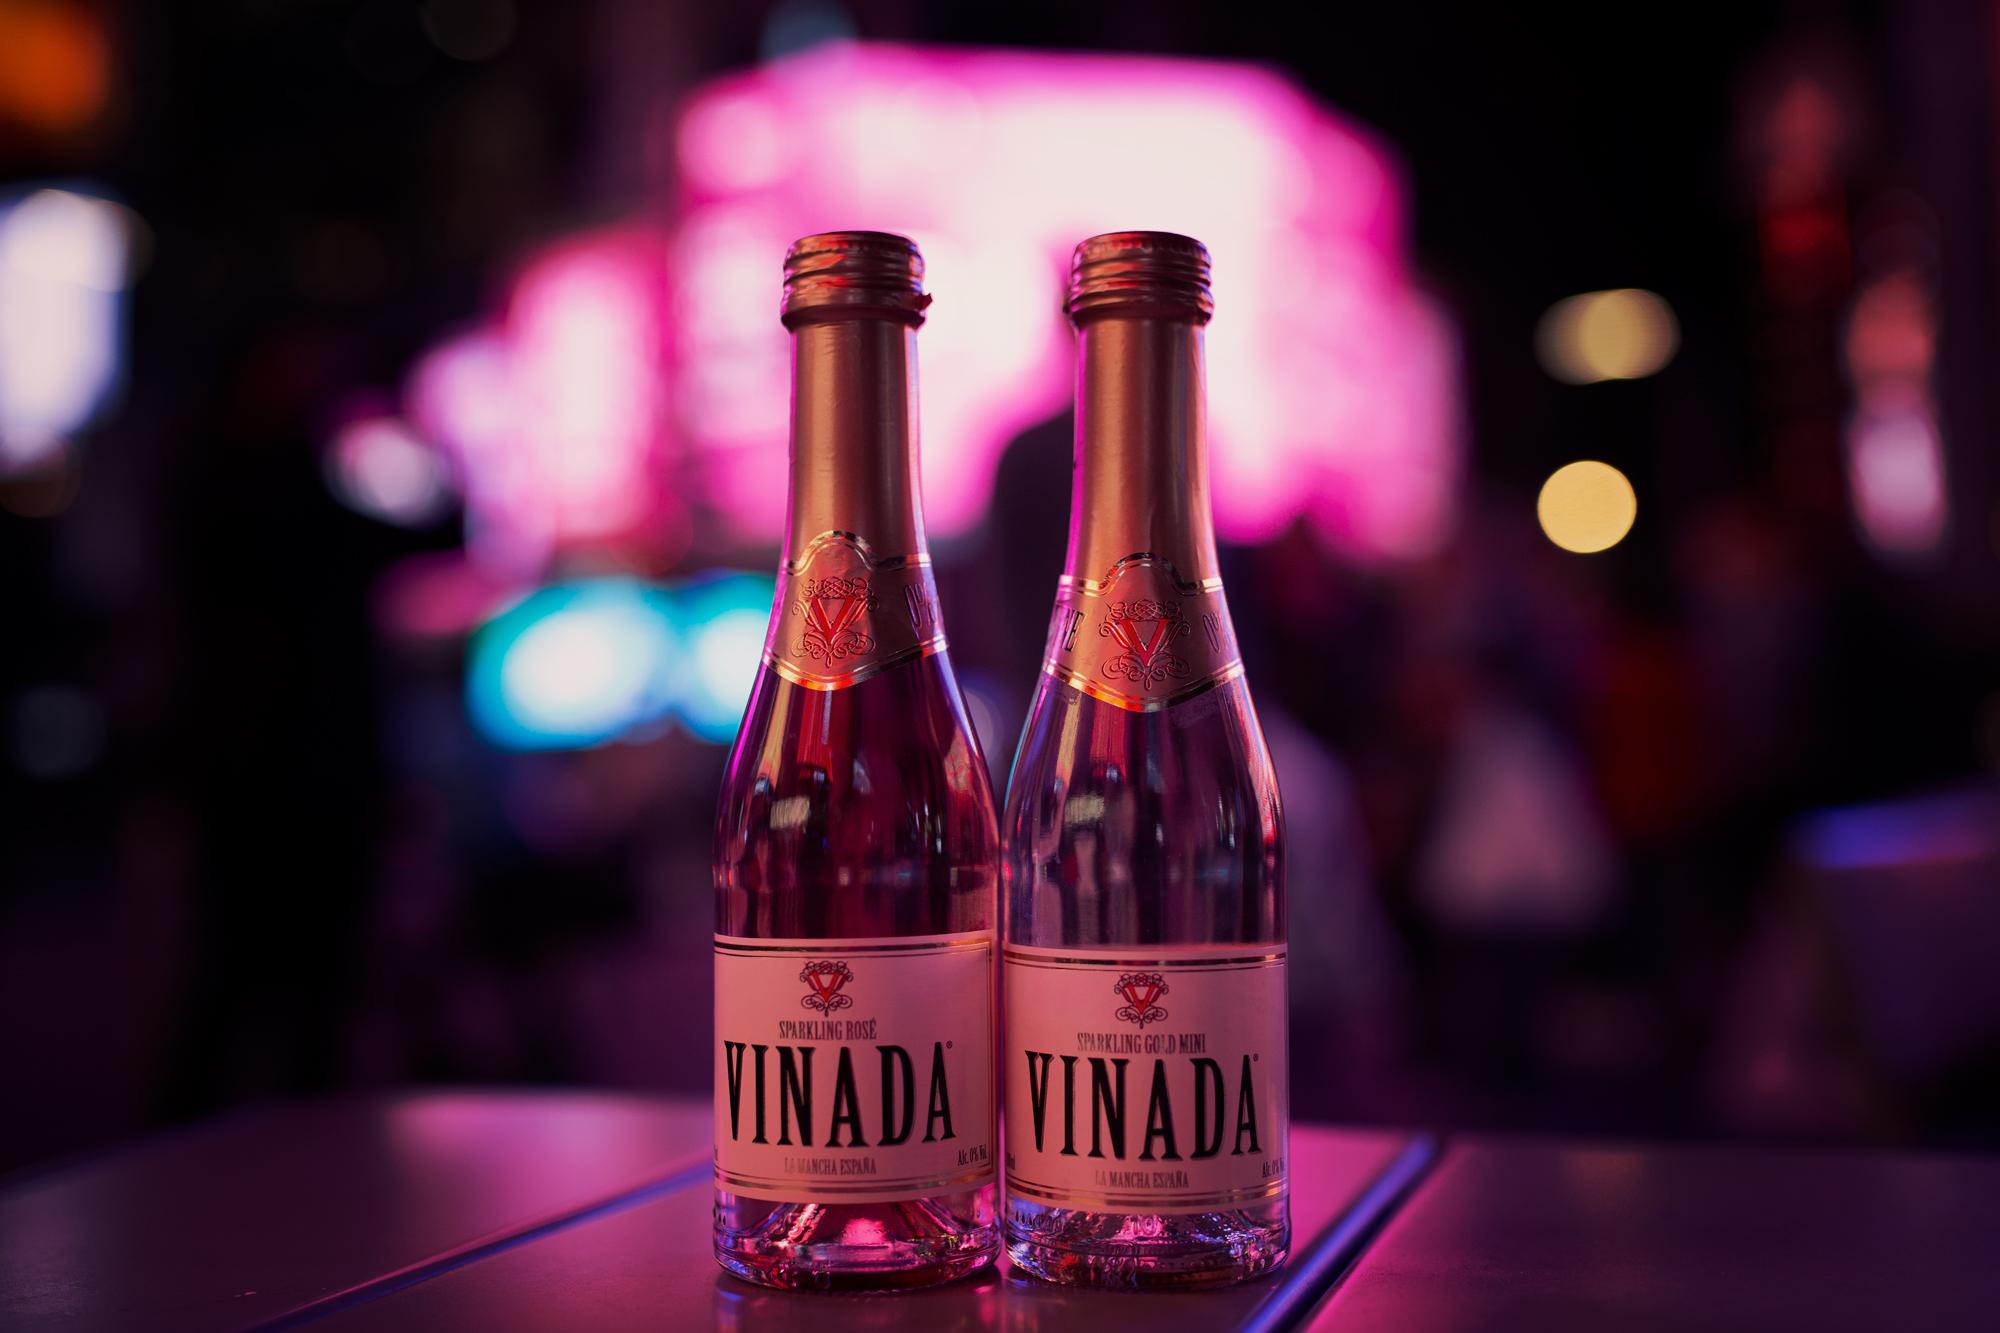 Vinada-New-York-Times-Square-.jpg